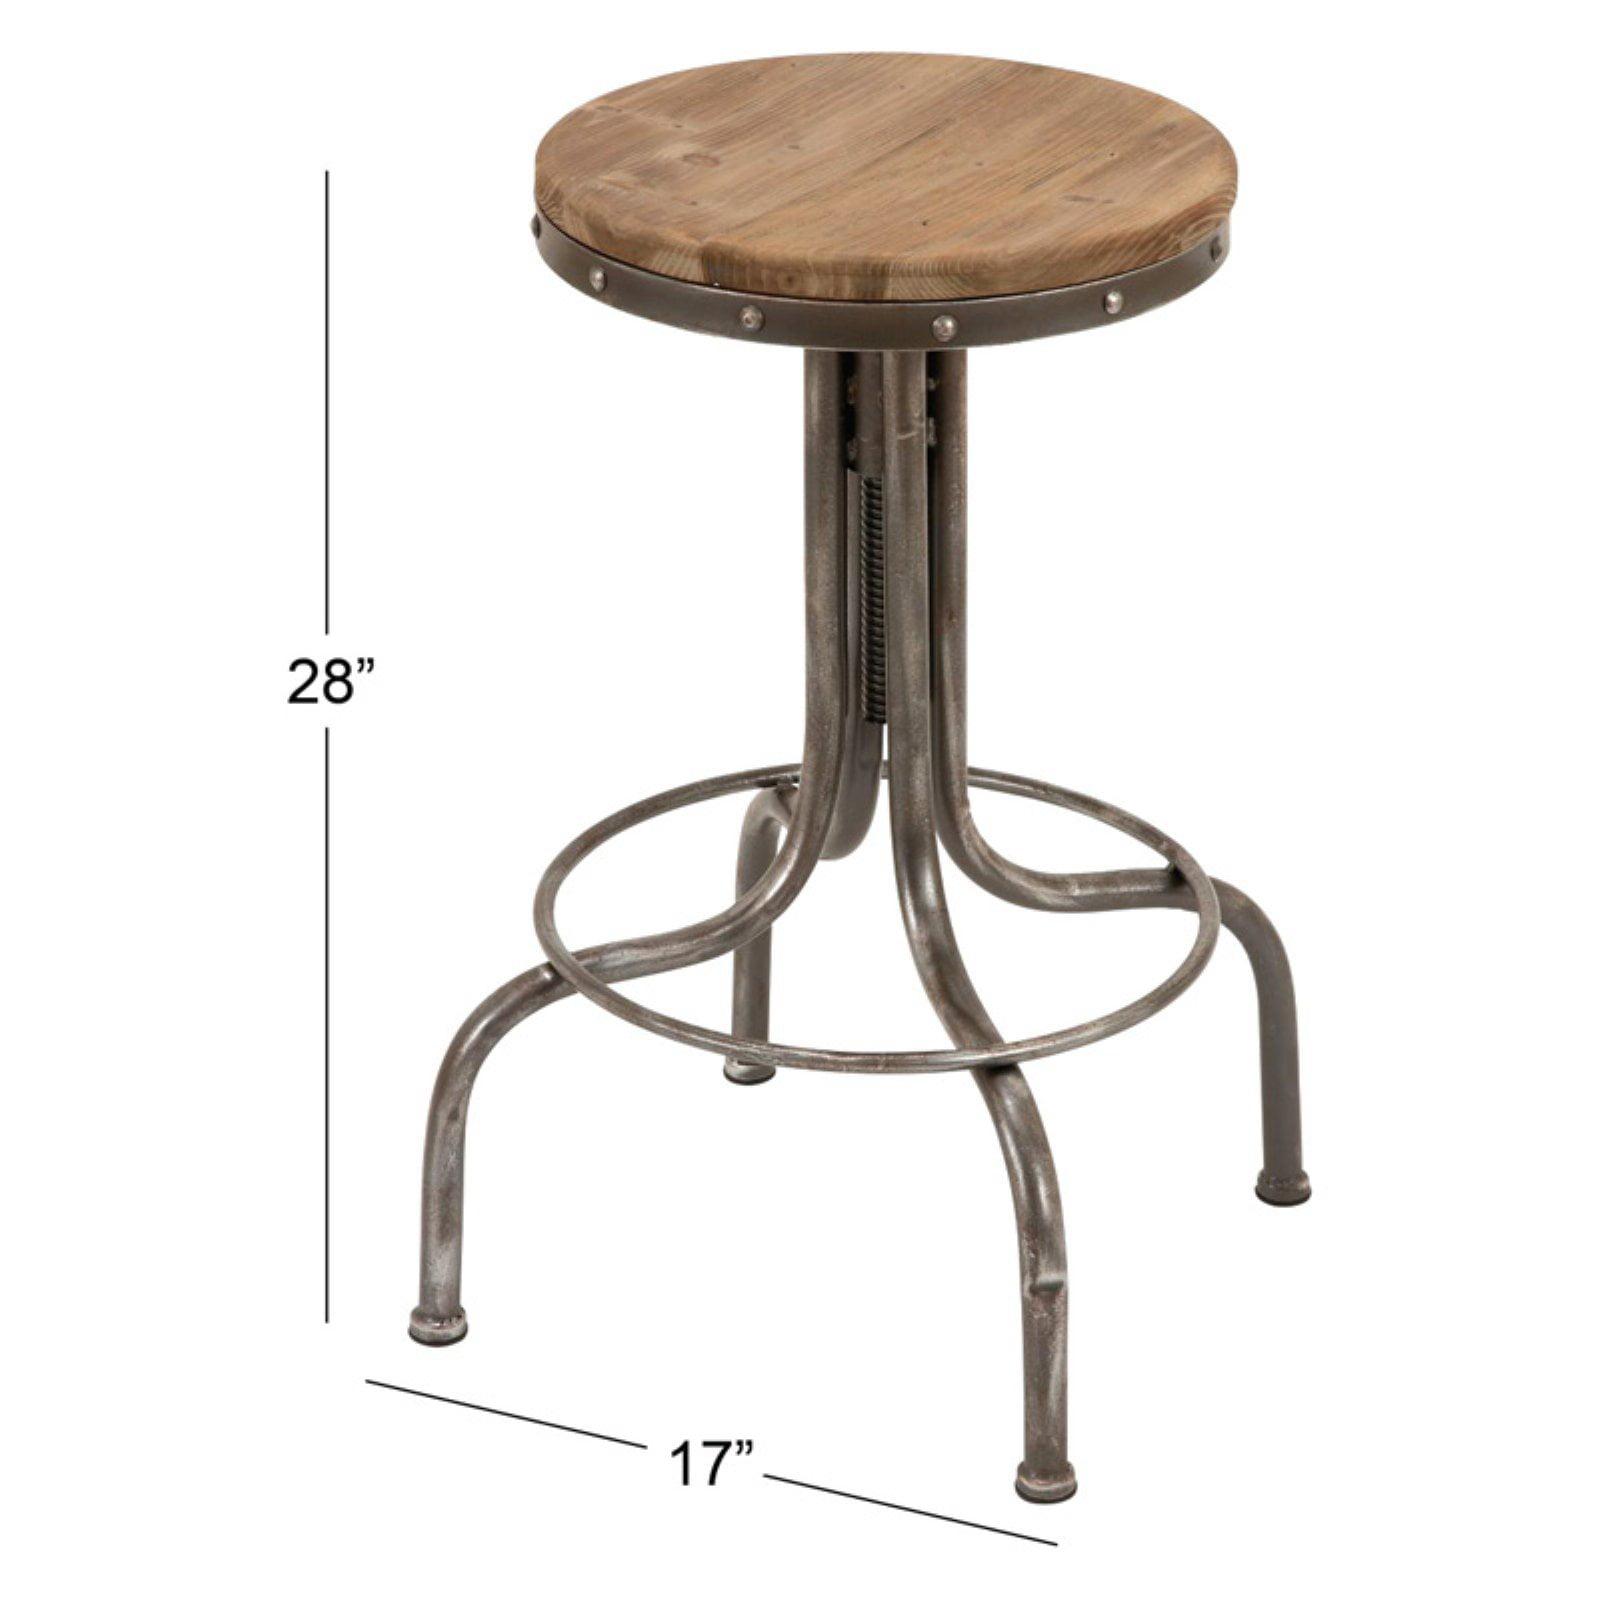 Astounding Decmode 17 X 28 Round Industrial Natural Wood Silver Adjustable Metal Bar Stool Machost Co Dining Chair Design Ideas Machostcouk